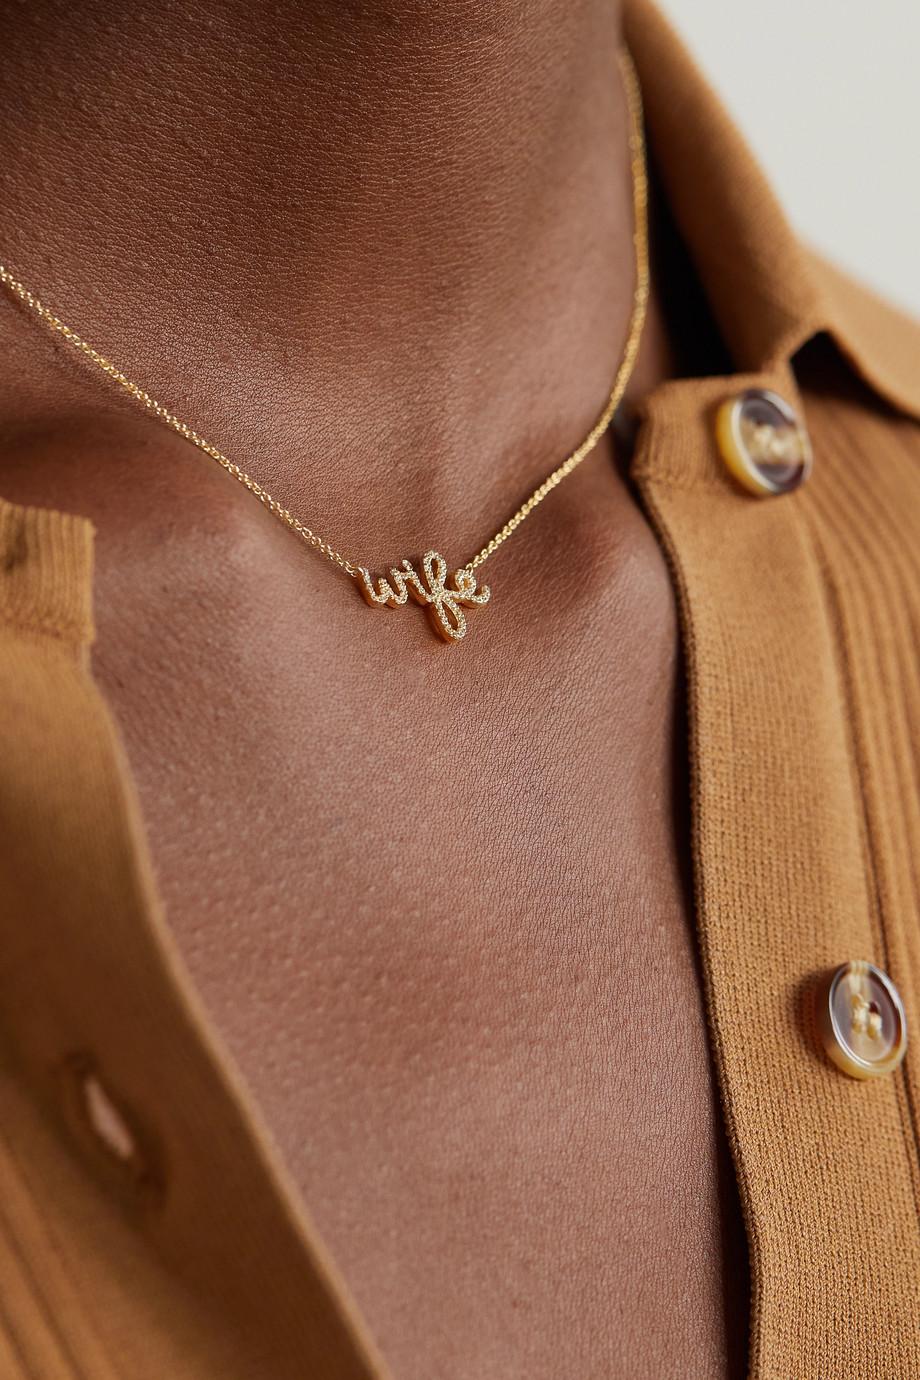 Sydney Evan Wife 14-karat gold diamond necklace